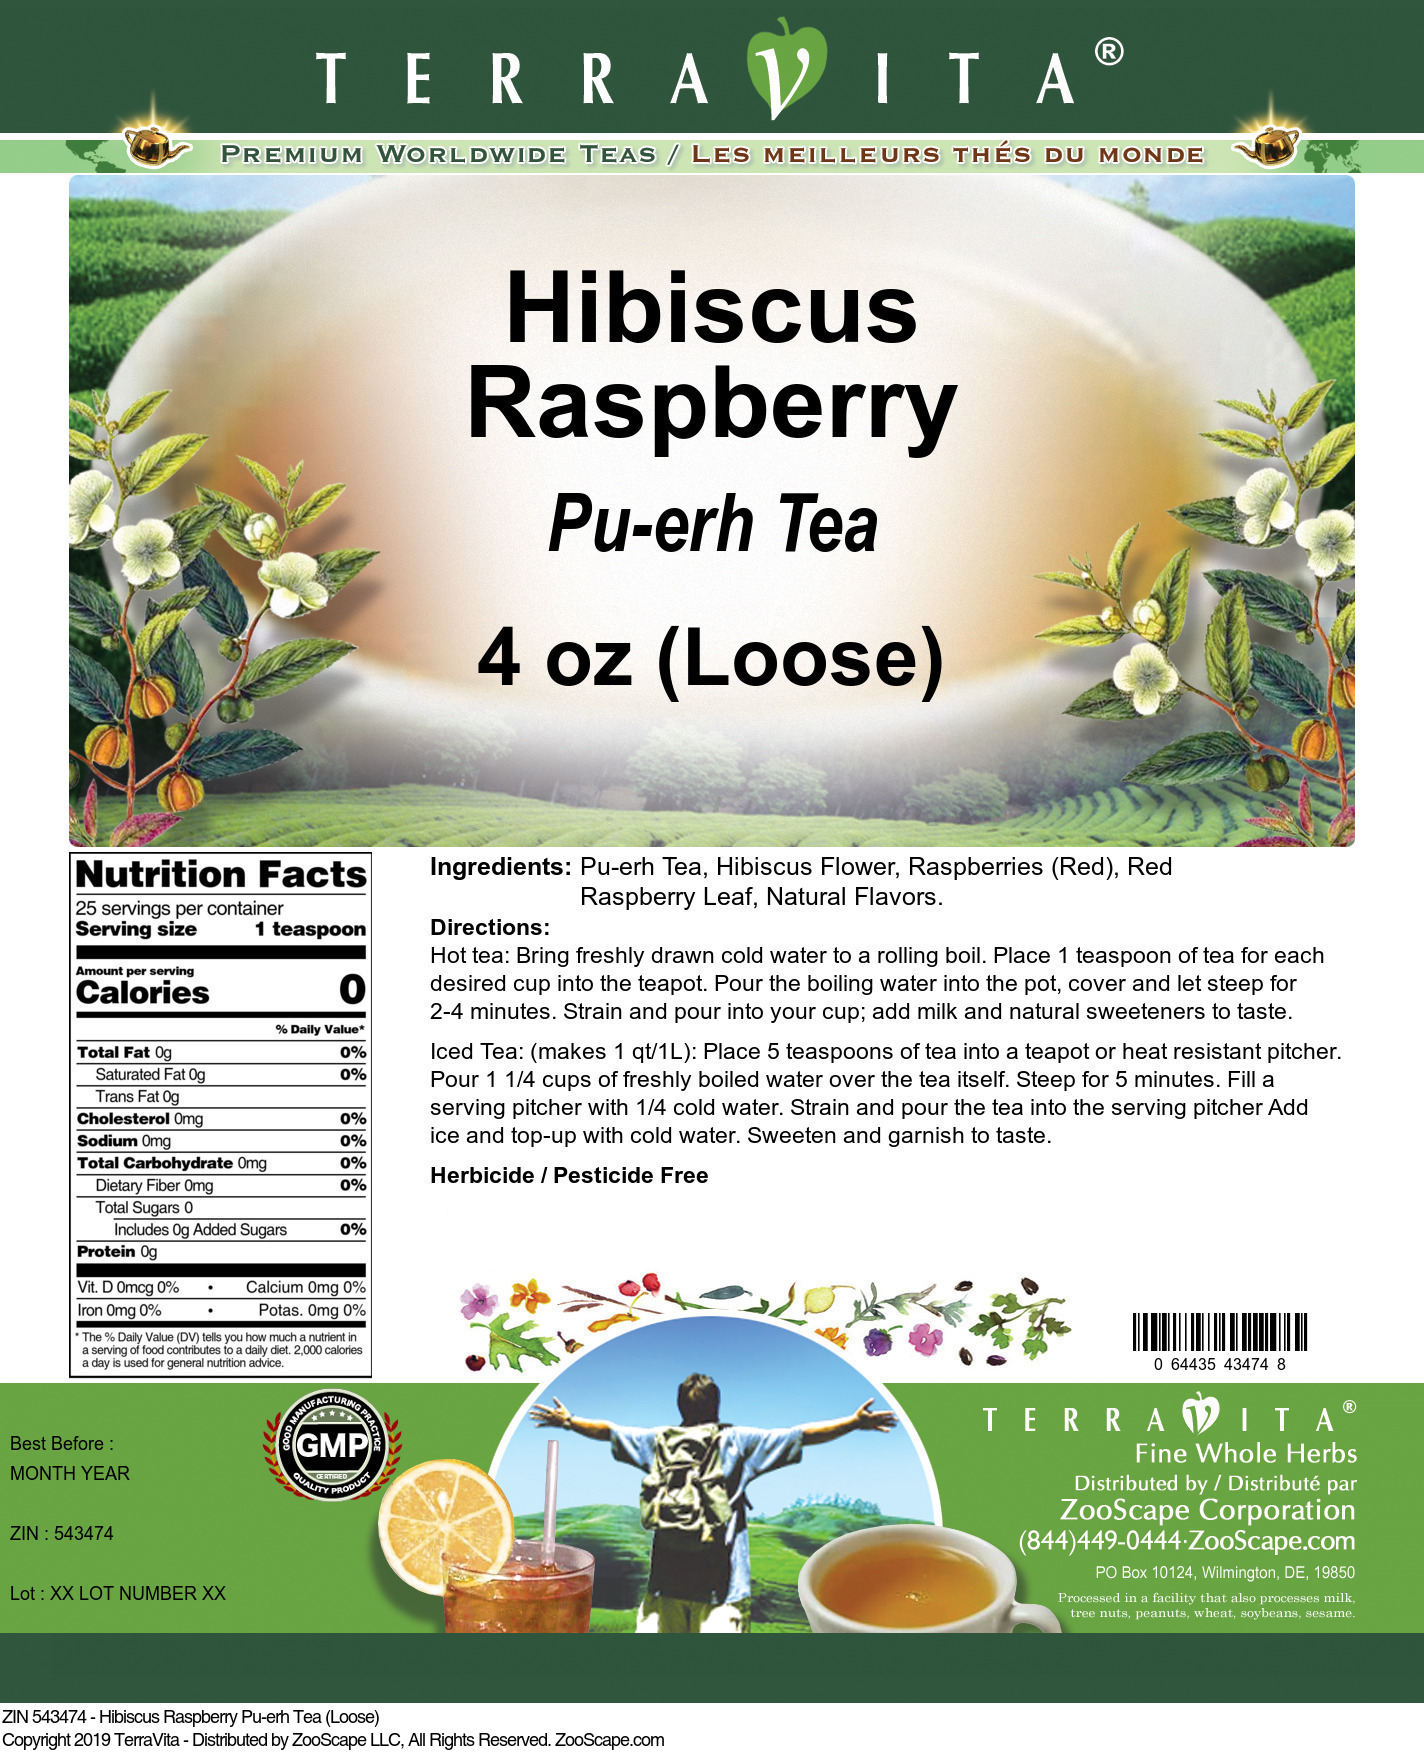 Hibiscus Raspberry Pu-erh Tea (Loose)